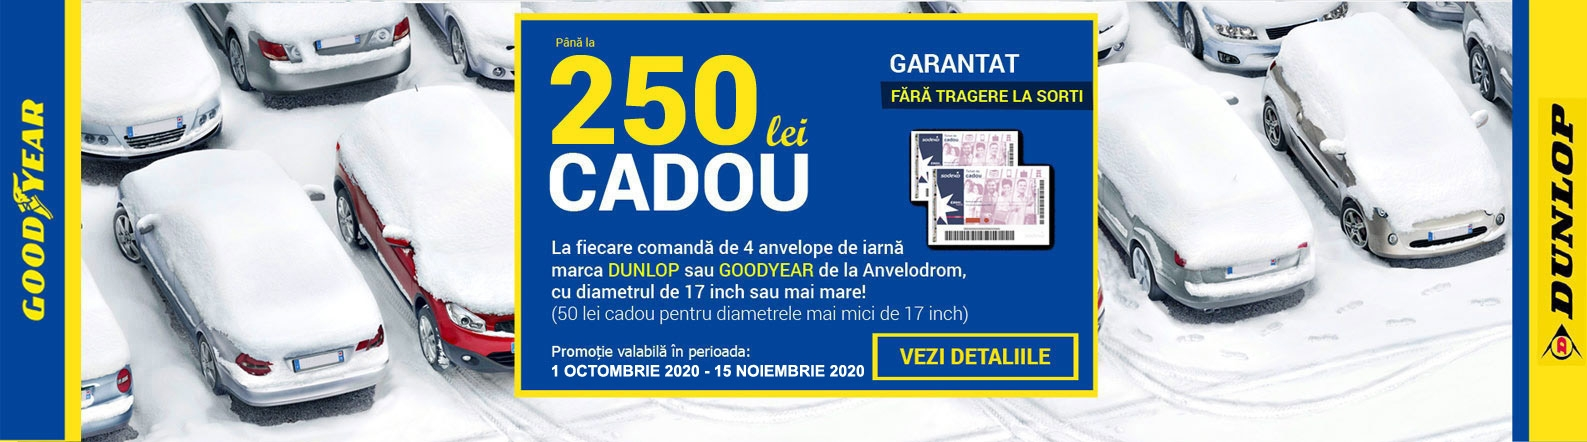 Promotie anvelope iarna Goodyear Dunlop